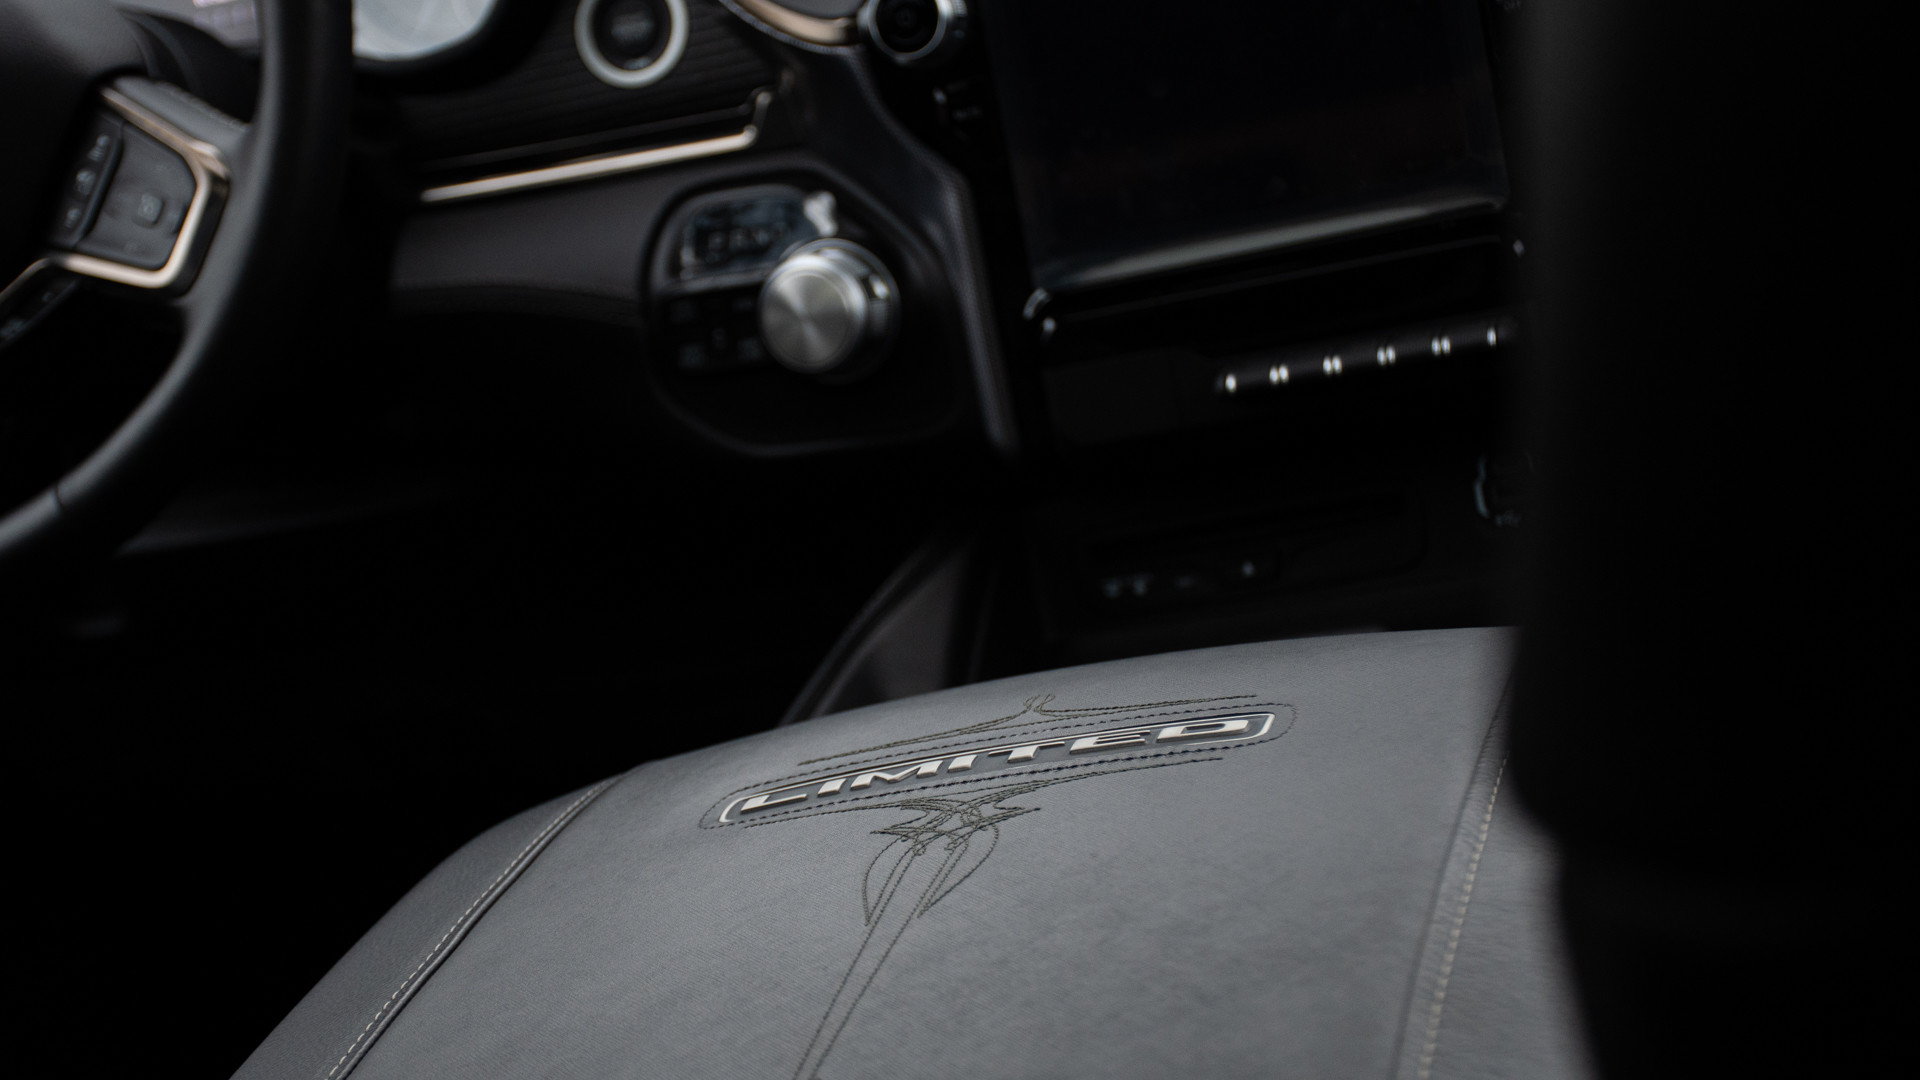 Premiumlederbezug in Schwarz